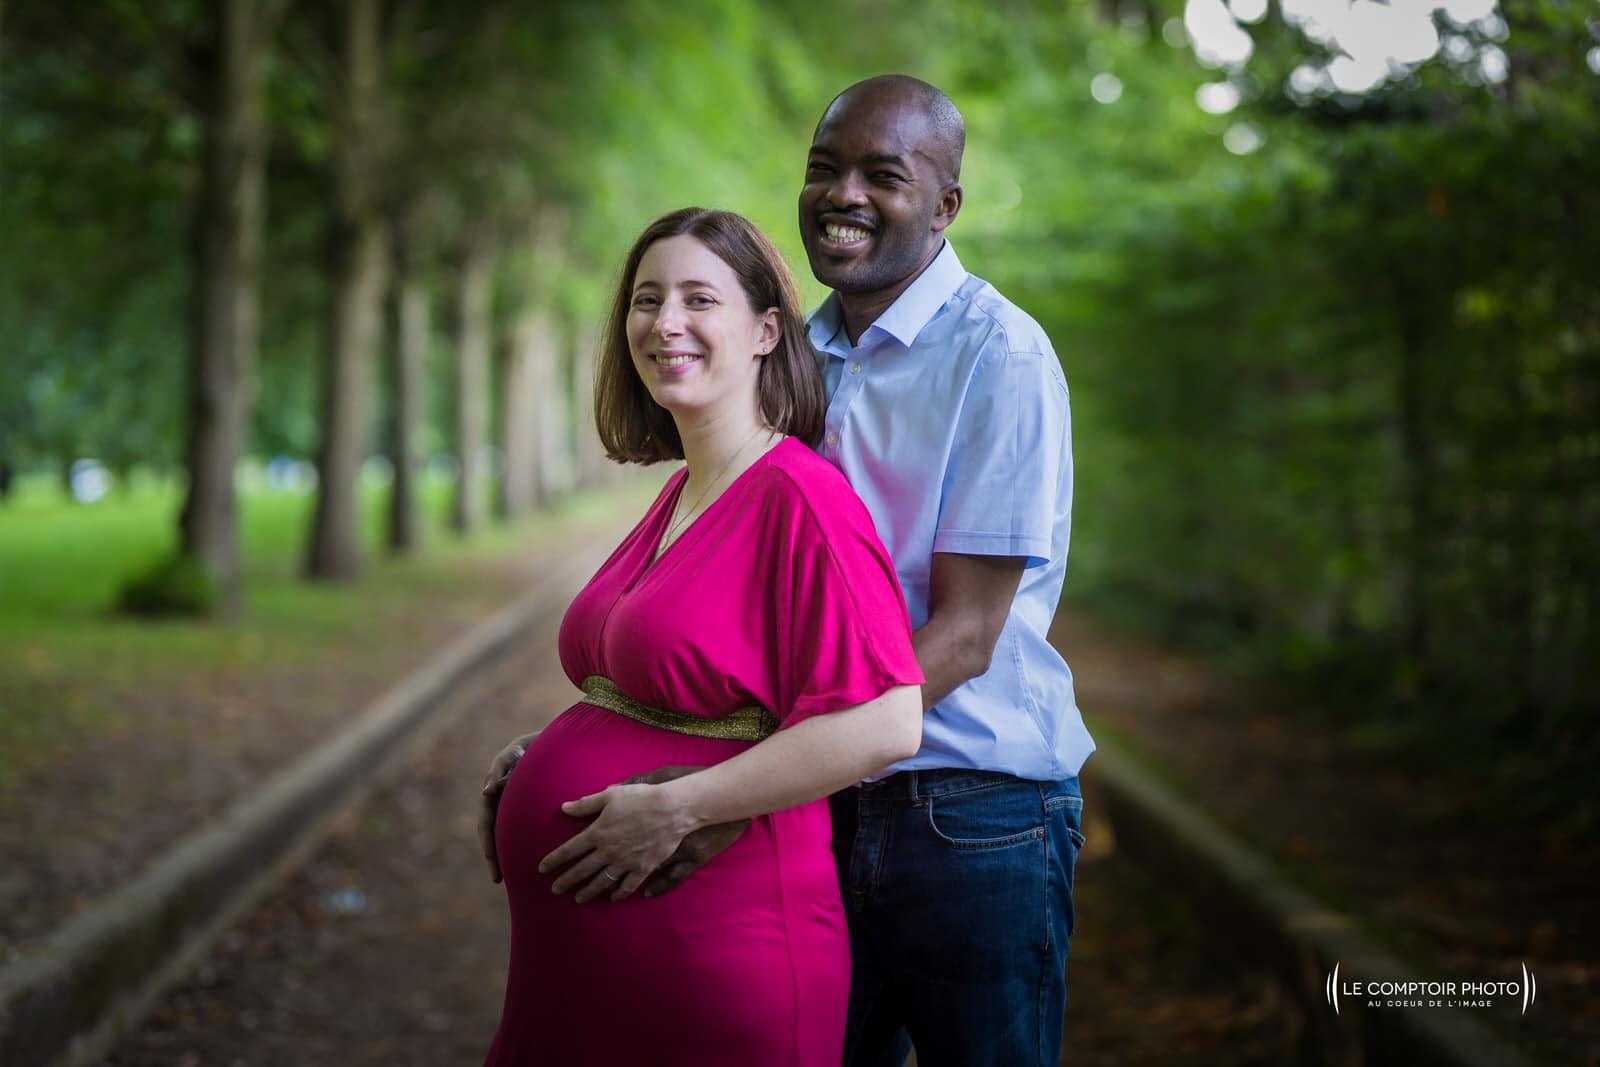 photographe de grossesse en bretagne 023 | Le Comptoir Photo